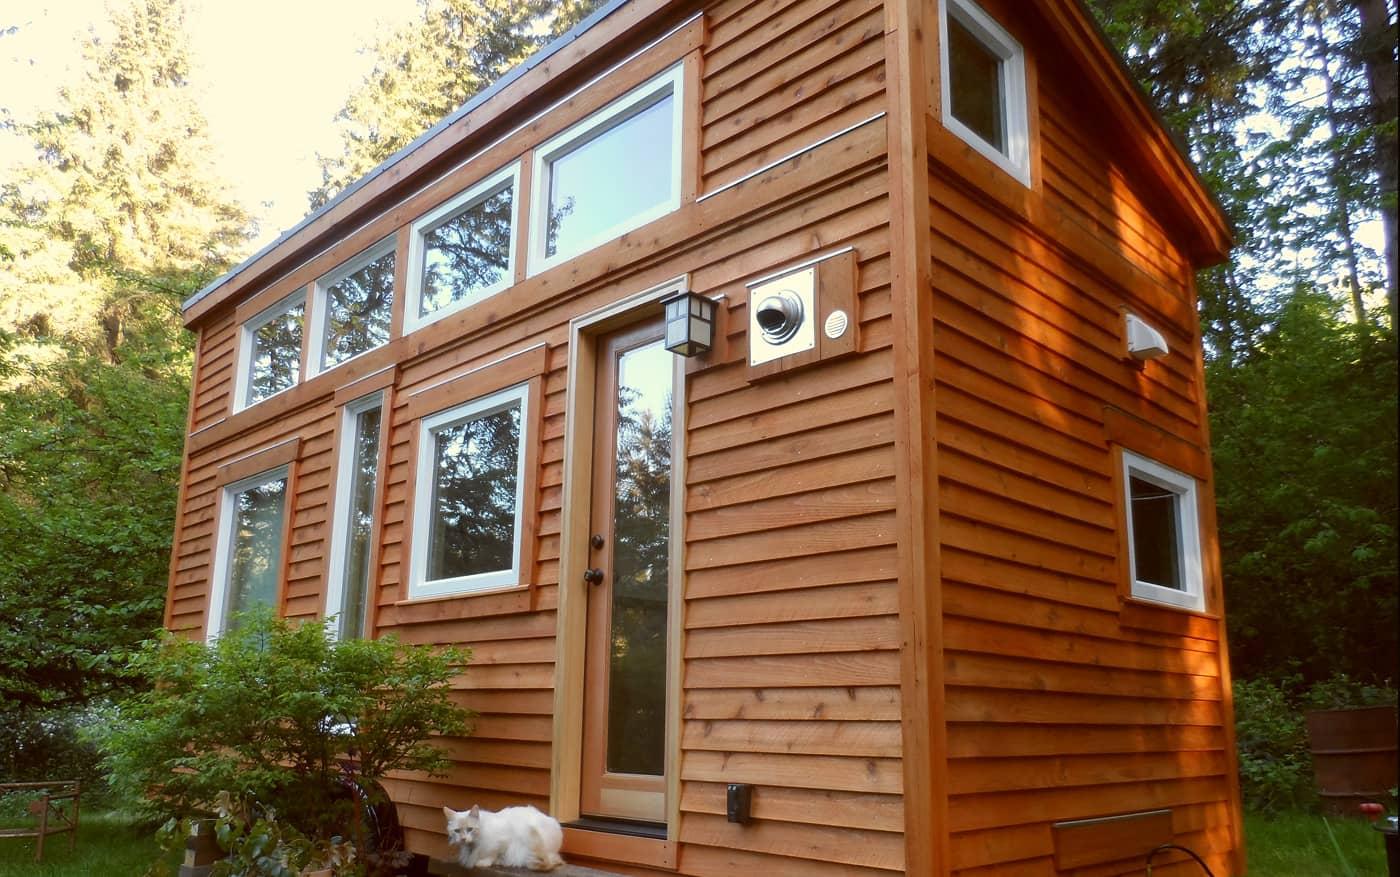 Oregon Cottage Company Tiny Homes